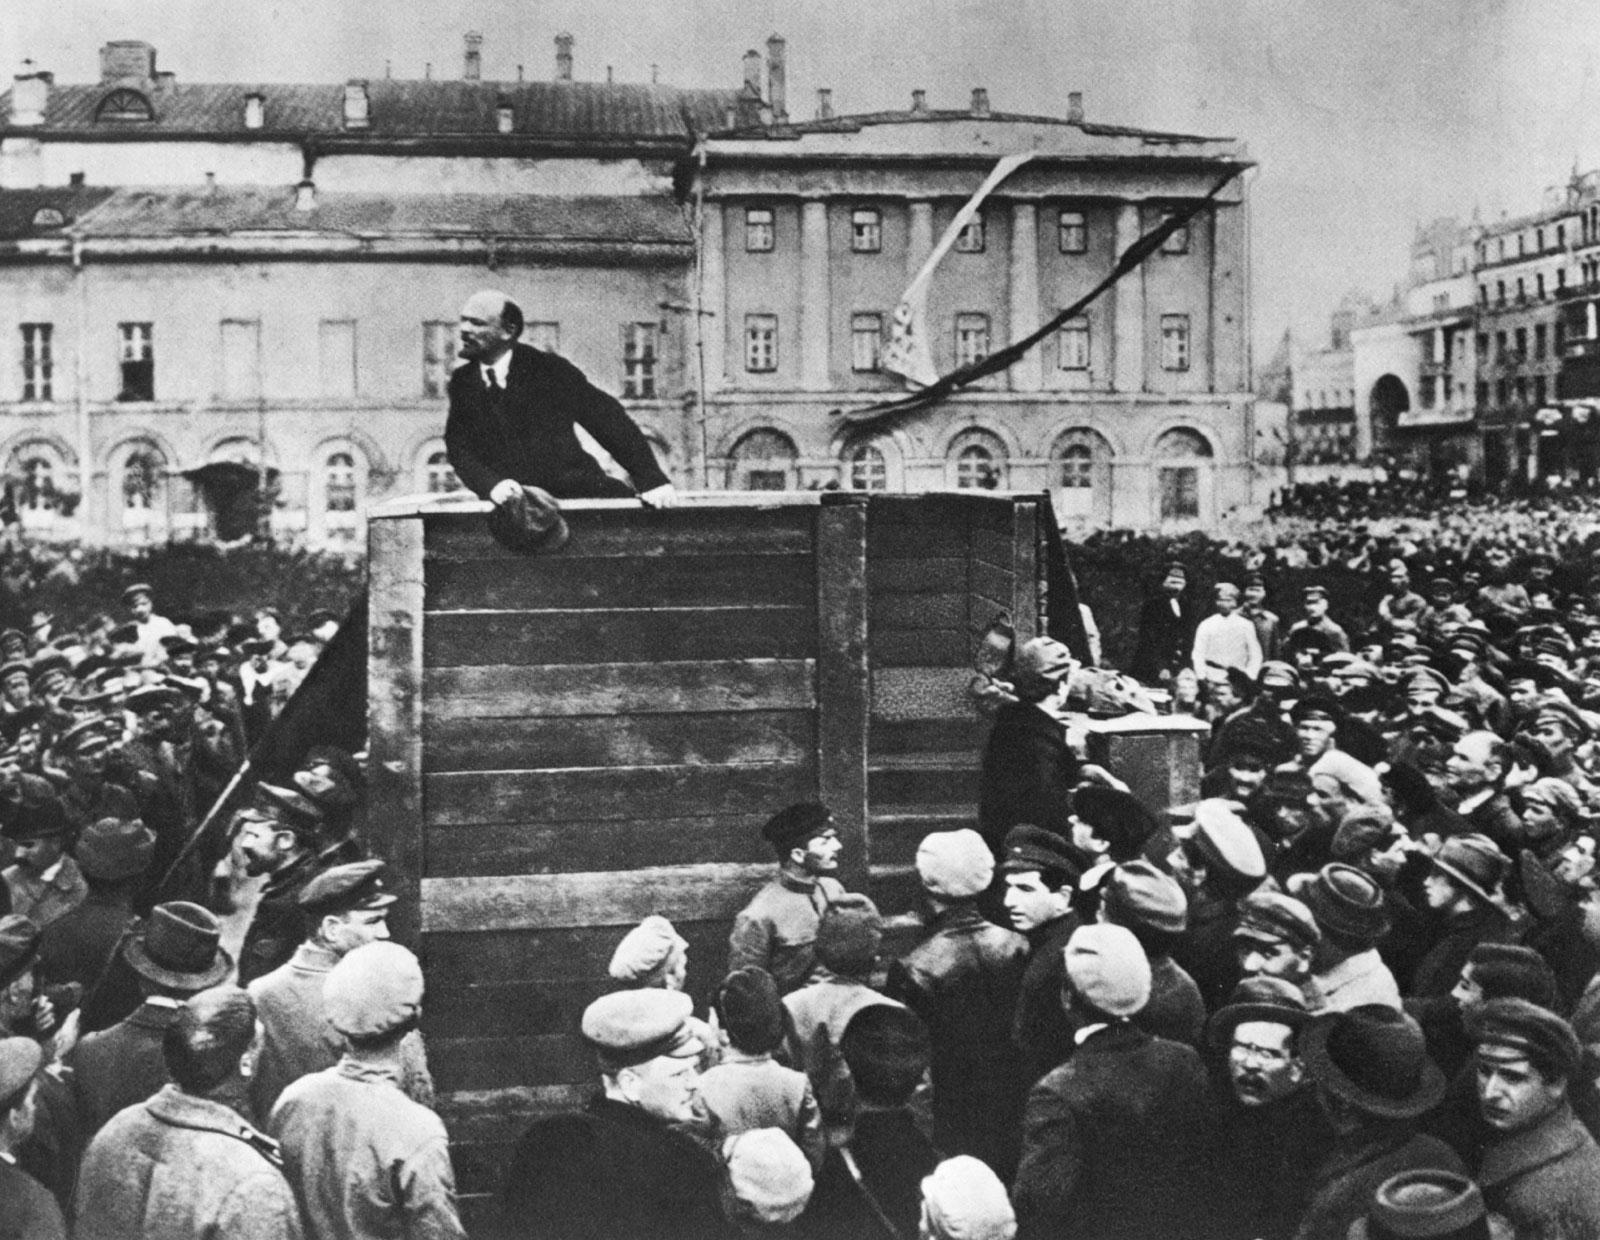 the bolshevik revolution essay Free essay: lenin's revolution at the start of the 20th century, the ruling tsar of  russia had absolute  lenin's role in the bolshevik revolution of 1917 essay.